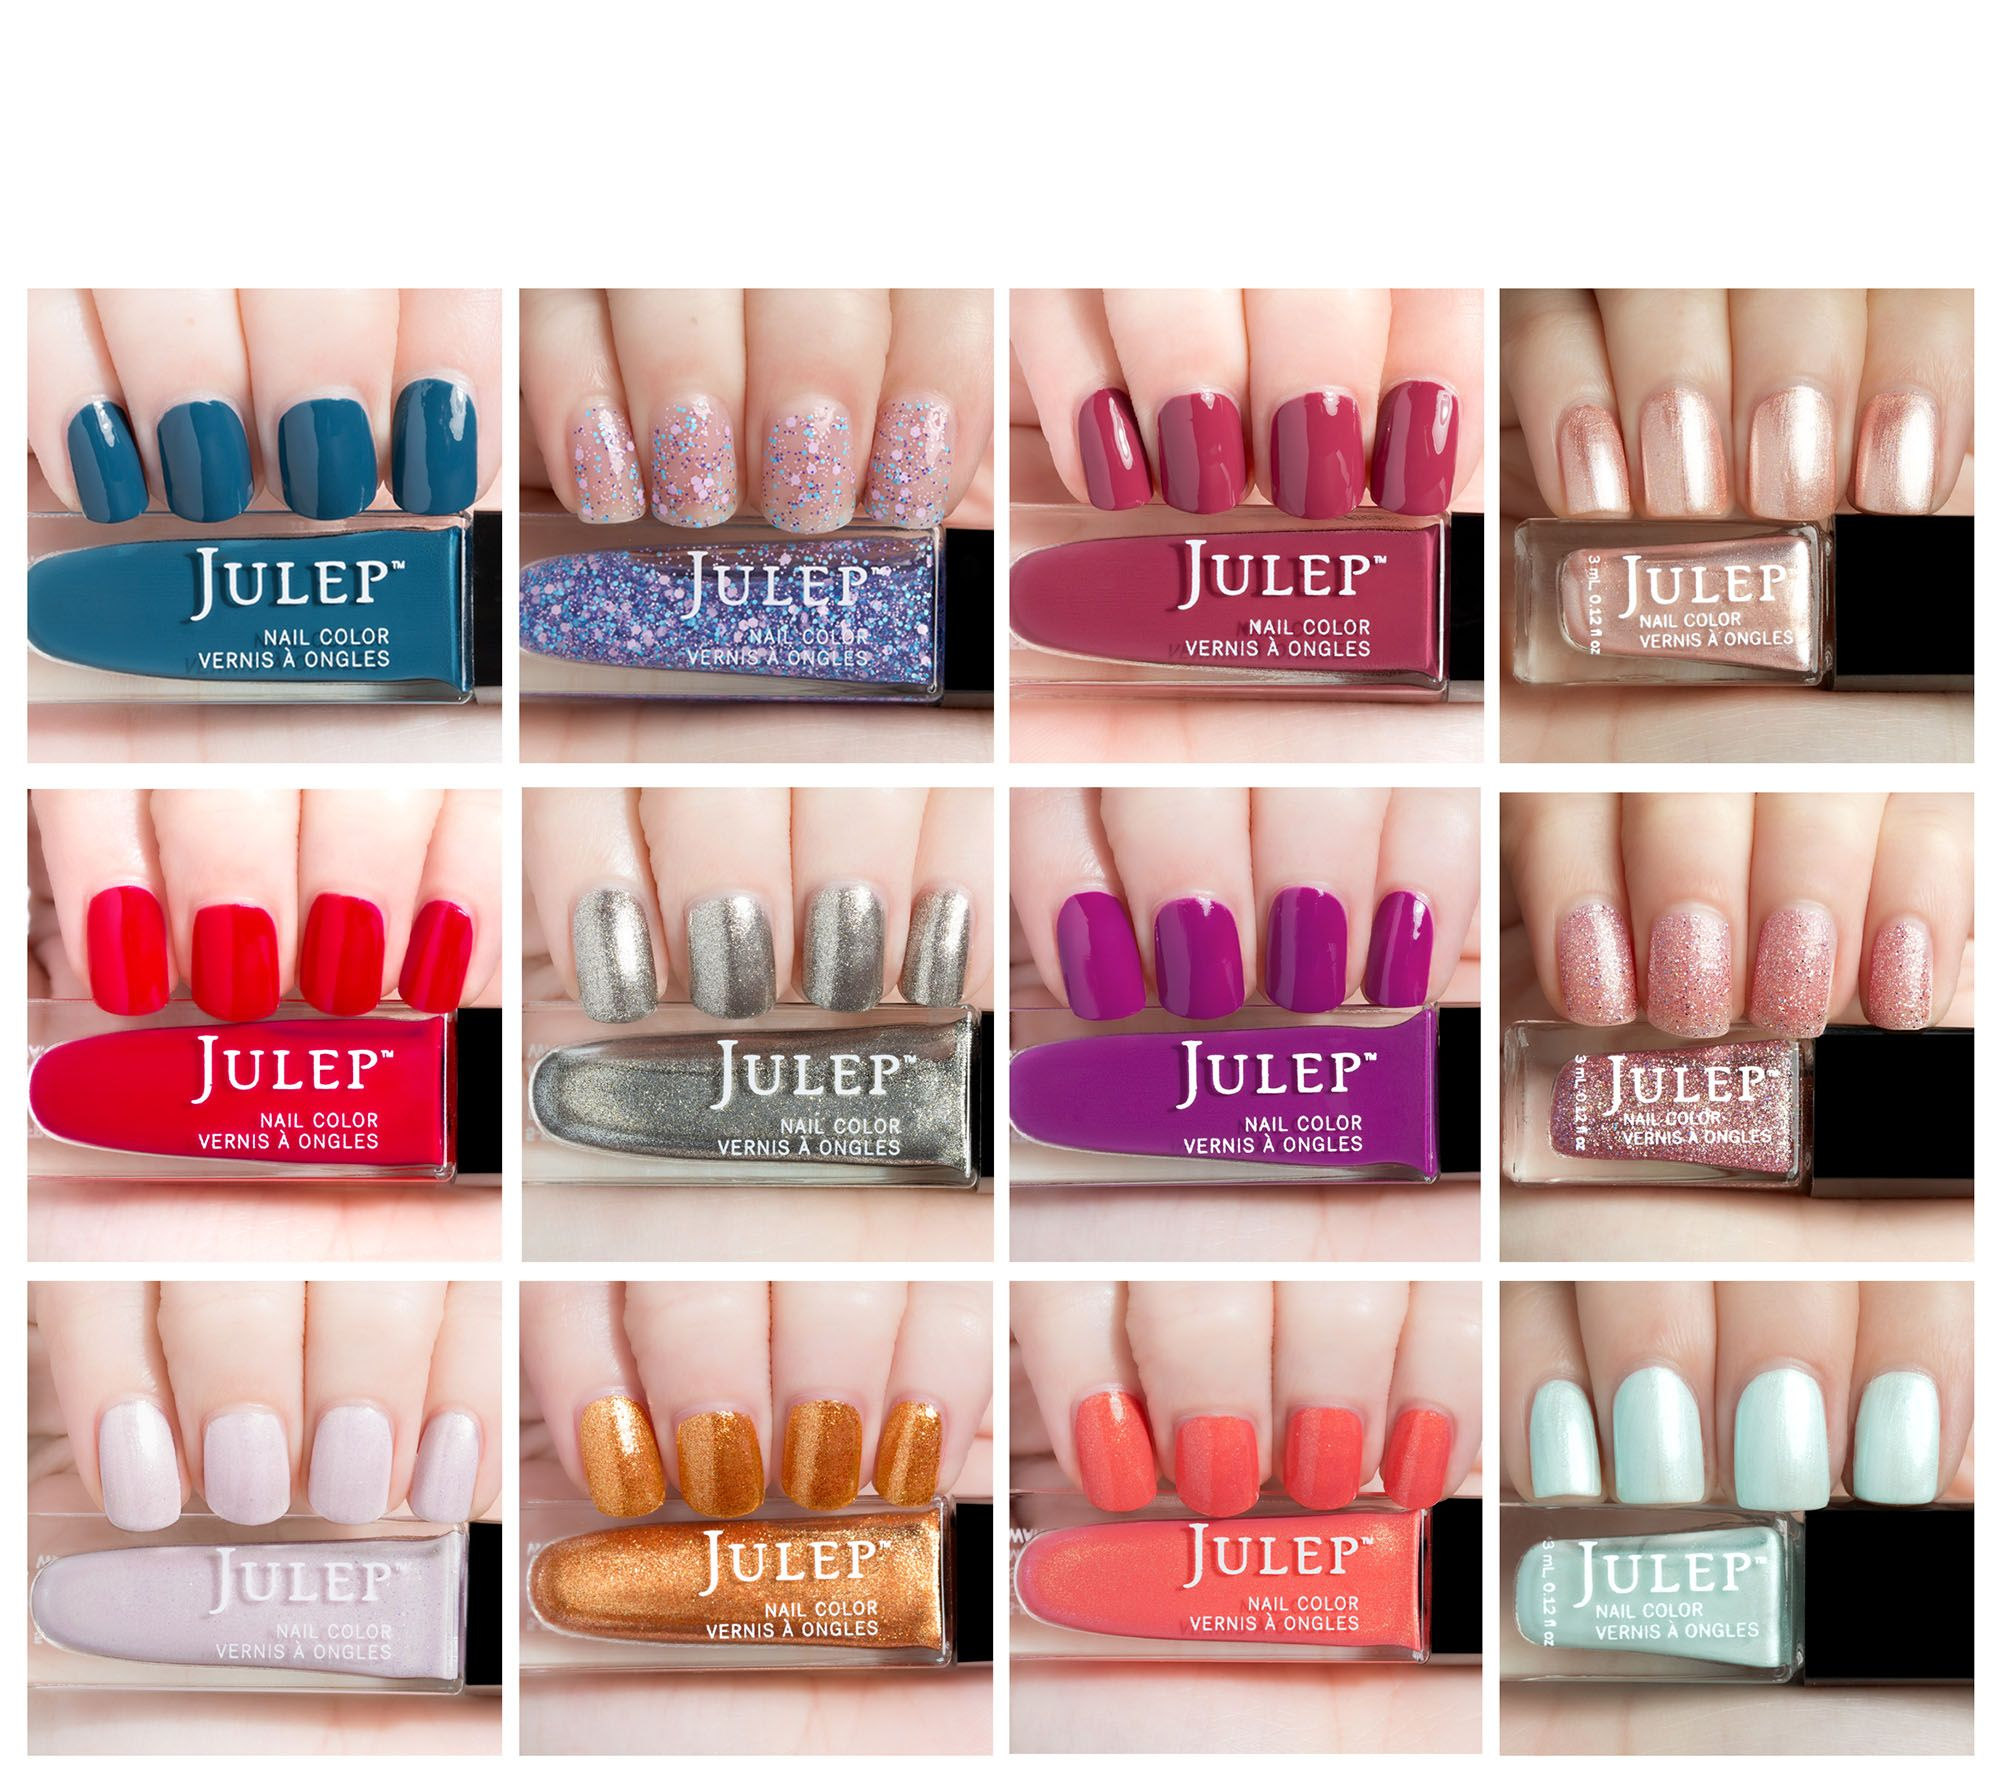 Julep #Coveted 12-piece Mini Nail Set - Page 1 — QVC.com